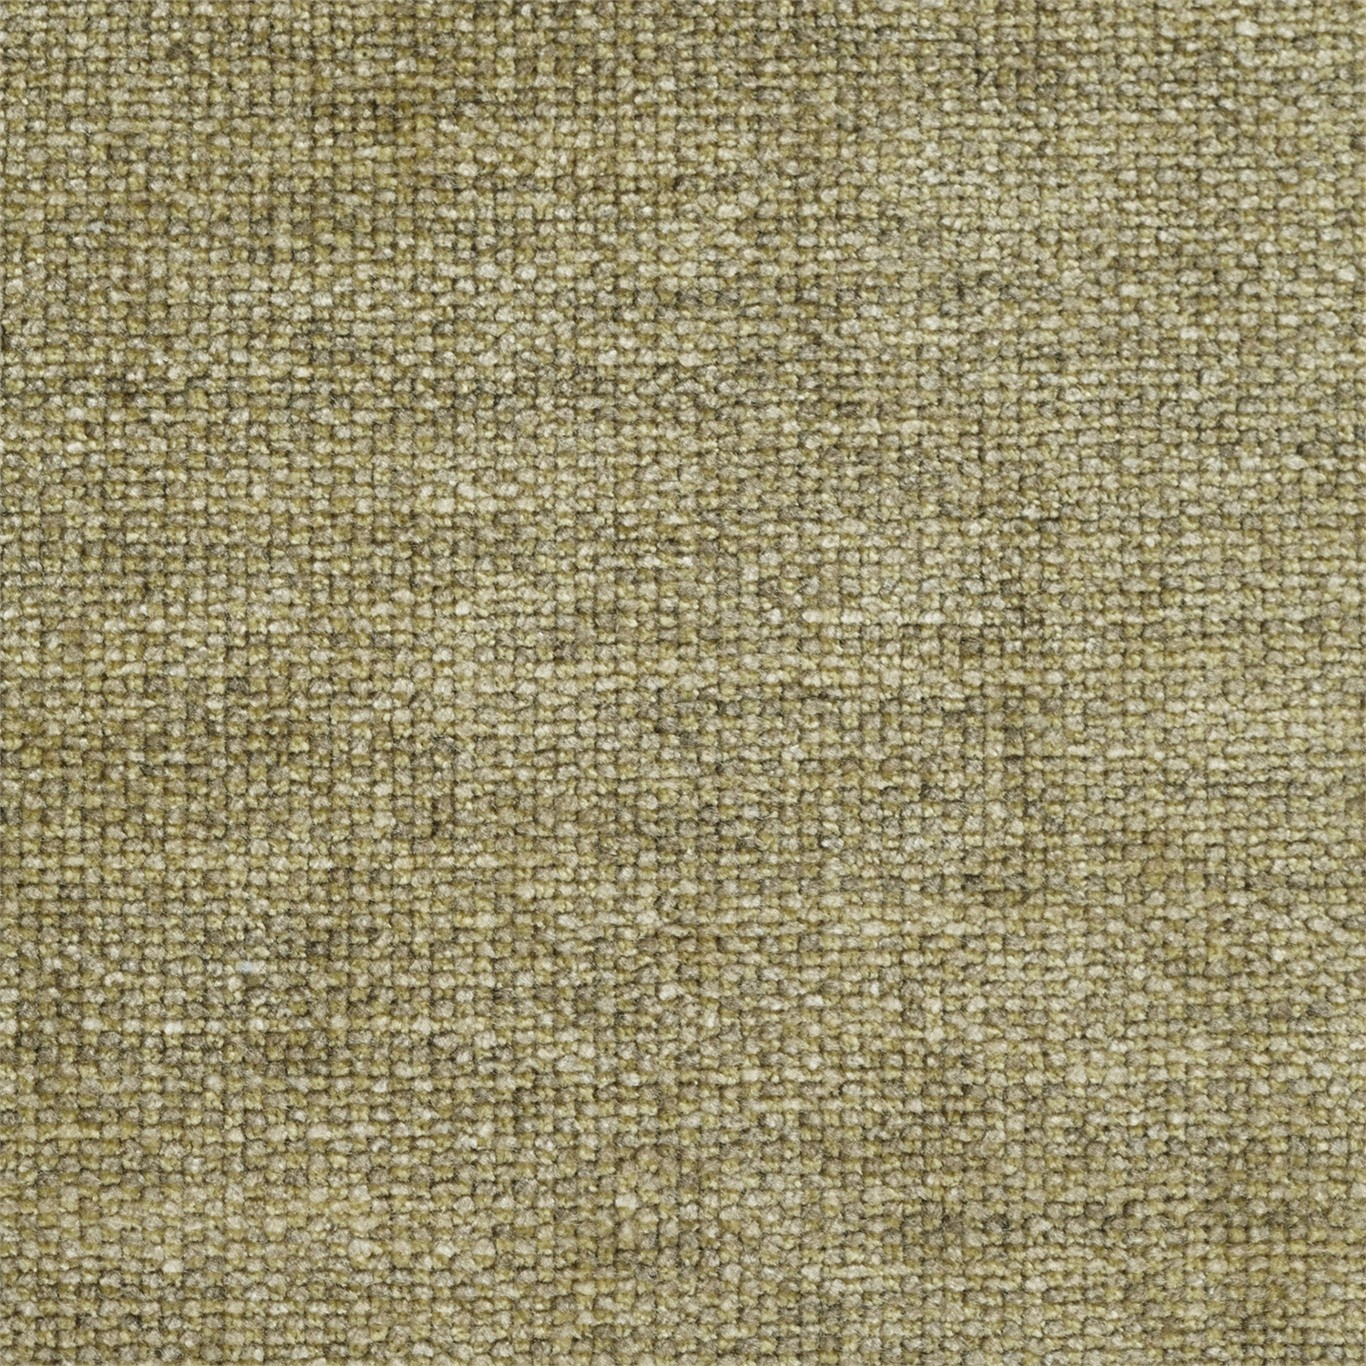 Image of Sanderson Moorbank Oatmeal Fabric 236298